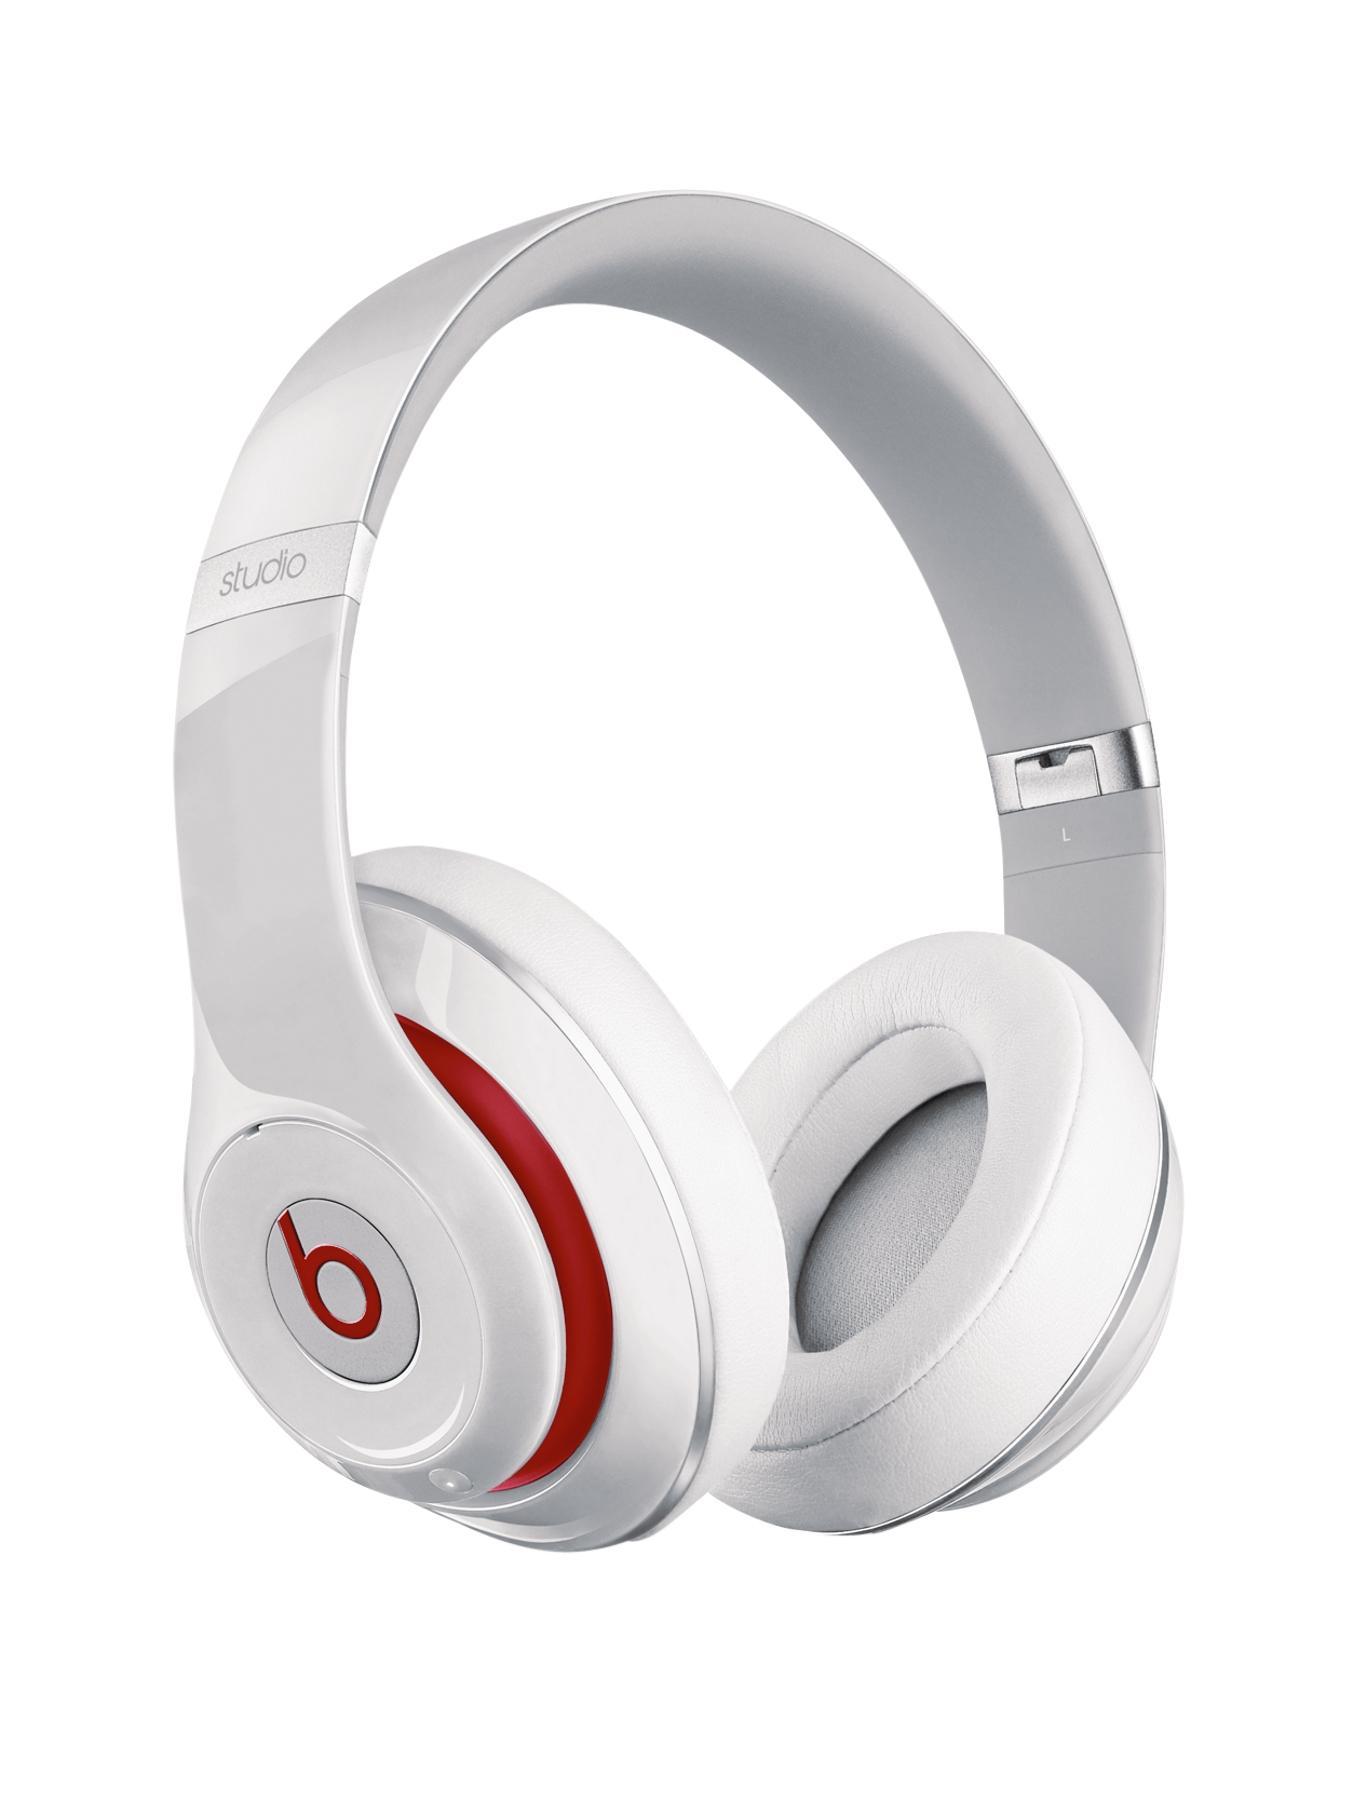 Beats by Dr Dre Studio 2.0 Headphones - White